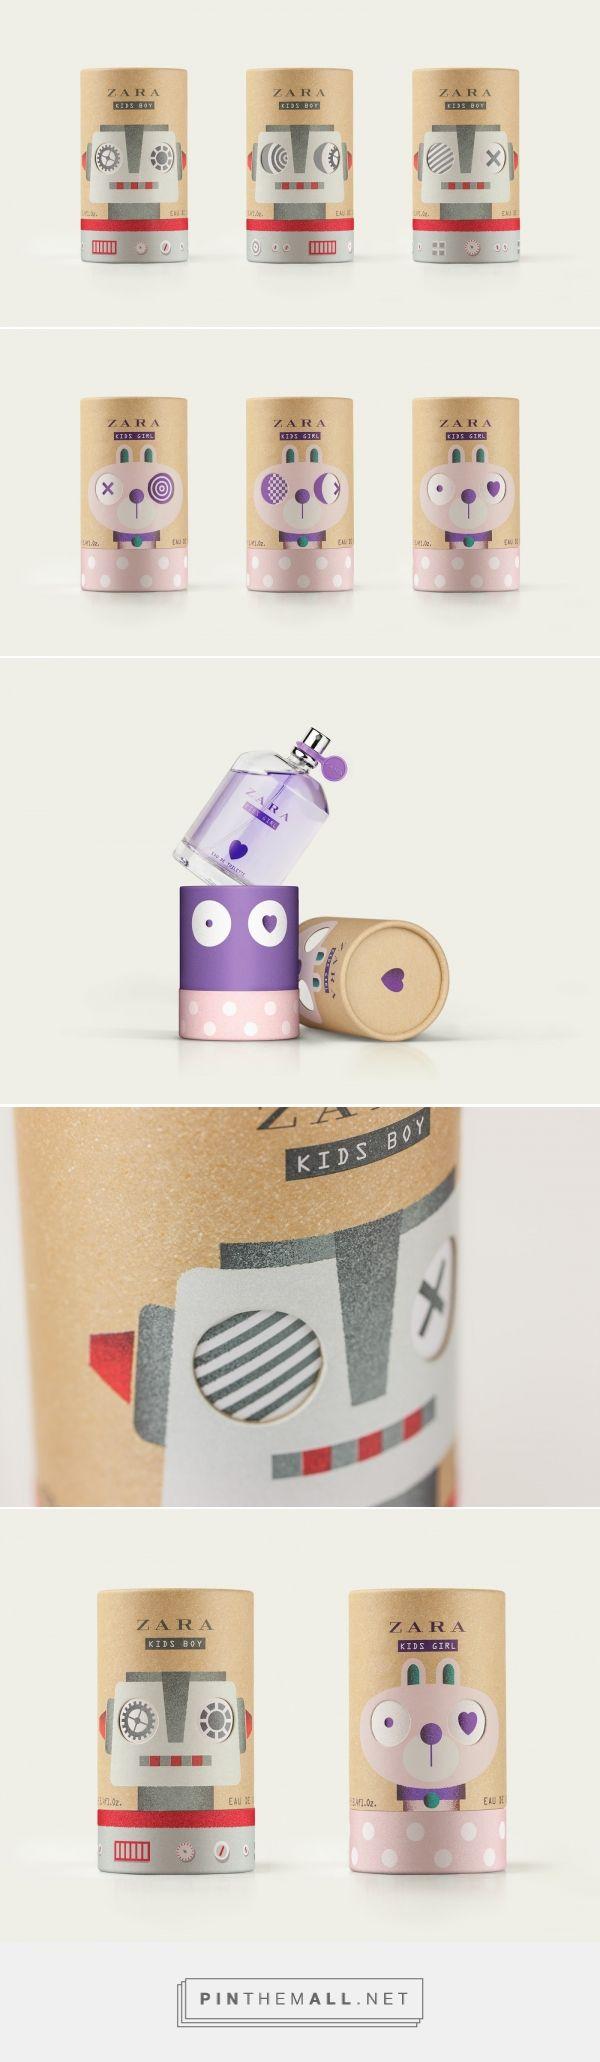 Zara Kids Fragrance packaging design by Lavernia & Cienfuegos - http://www.packagingoftheworld.com/2017/05/zara-kids-fragrance.html